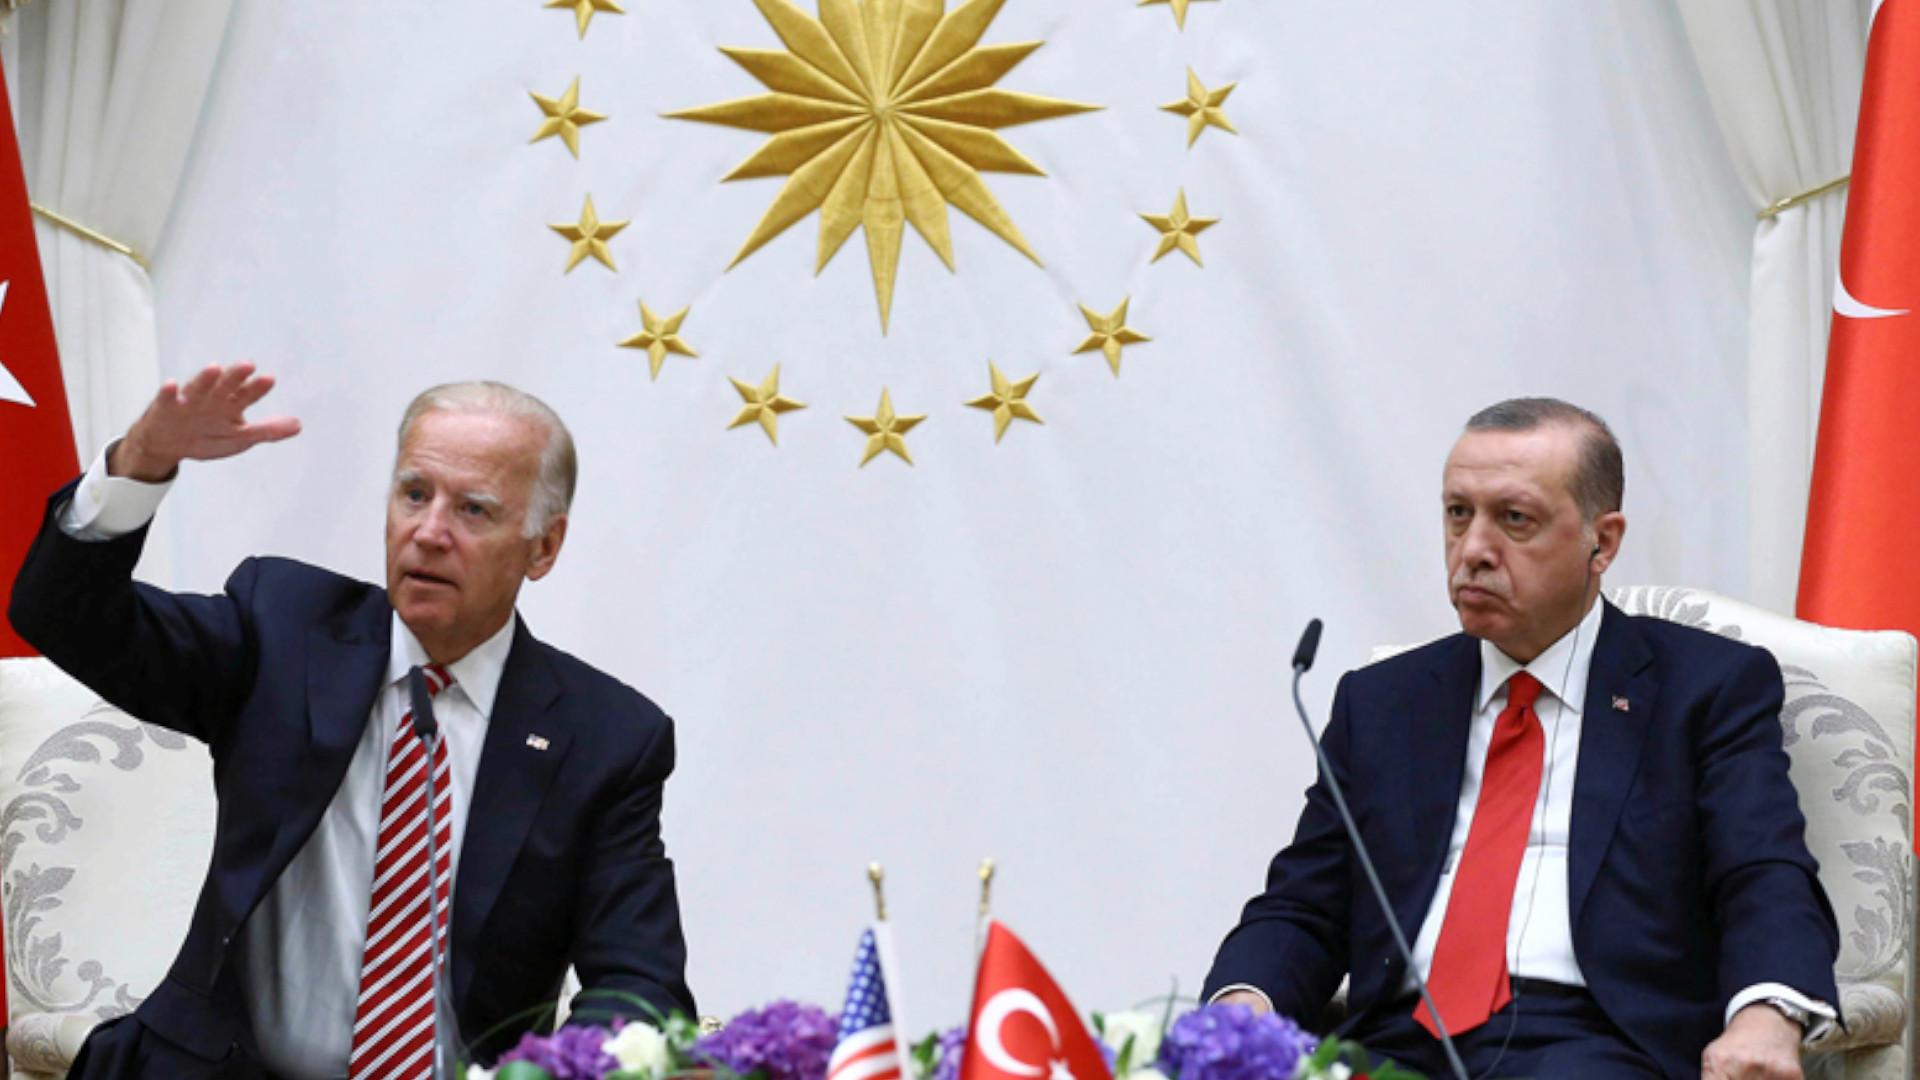 Turkey hopes Erdoğan-Biden meeting will 'yield positive results'